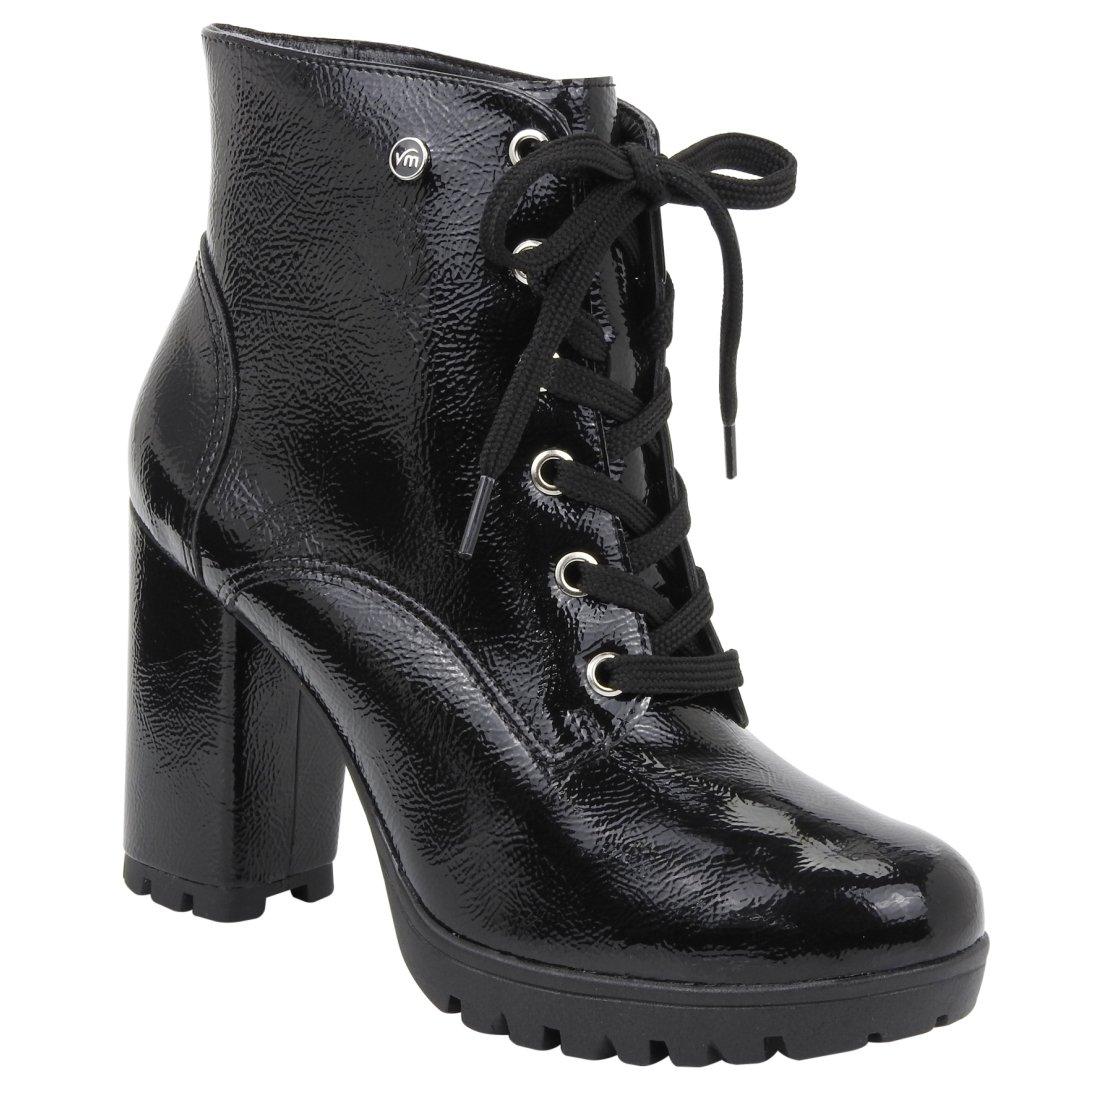 f3ef576f96 Bota Ankle Boot Via Marte 18-4405 - Preto (Verniz Glamour) - Botas ...